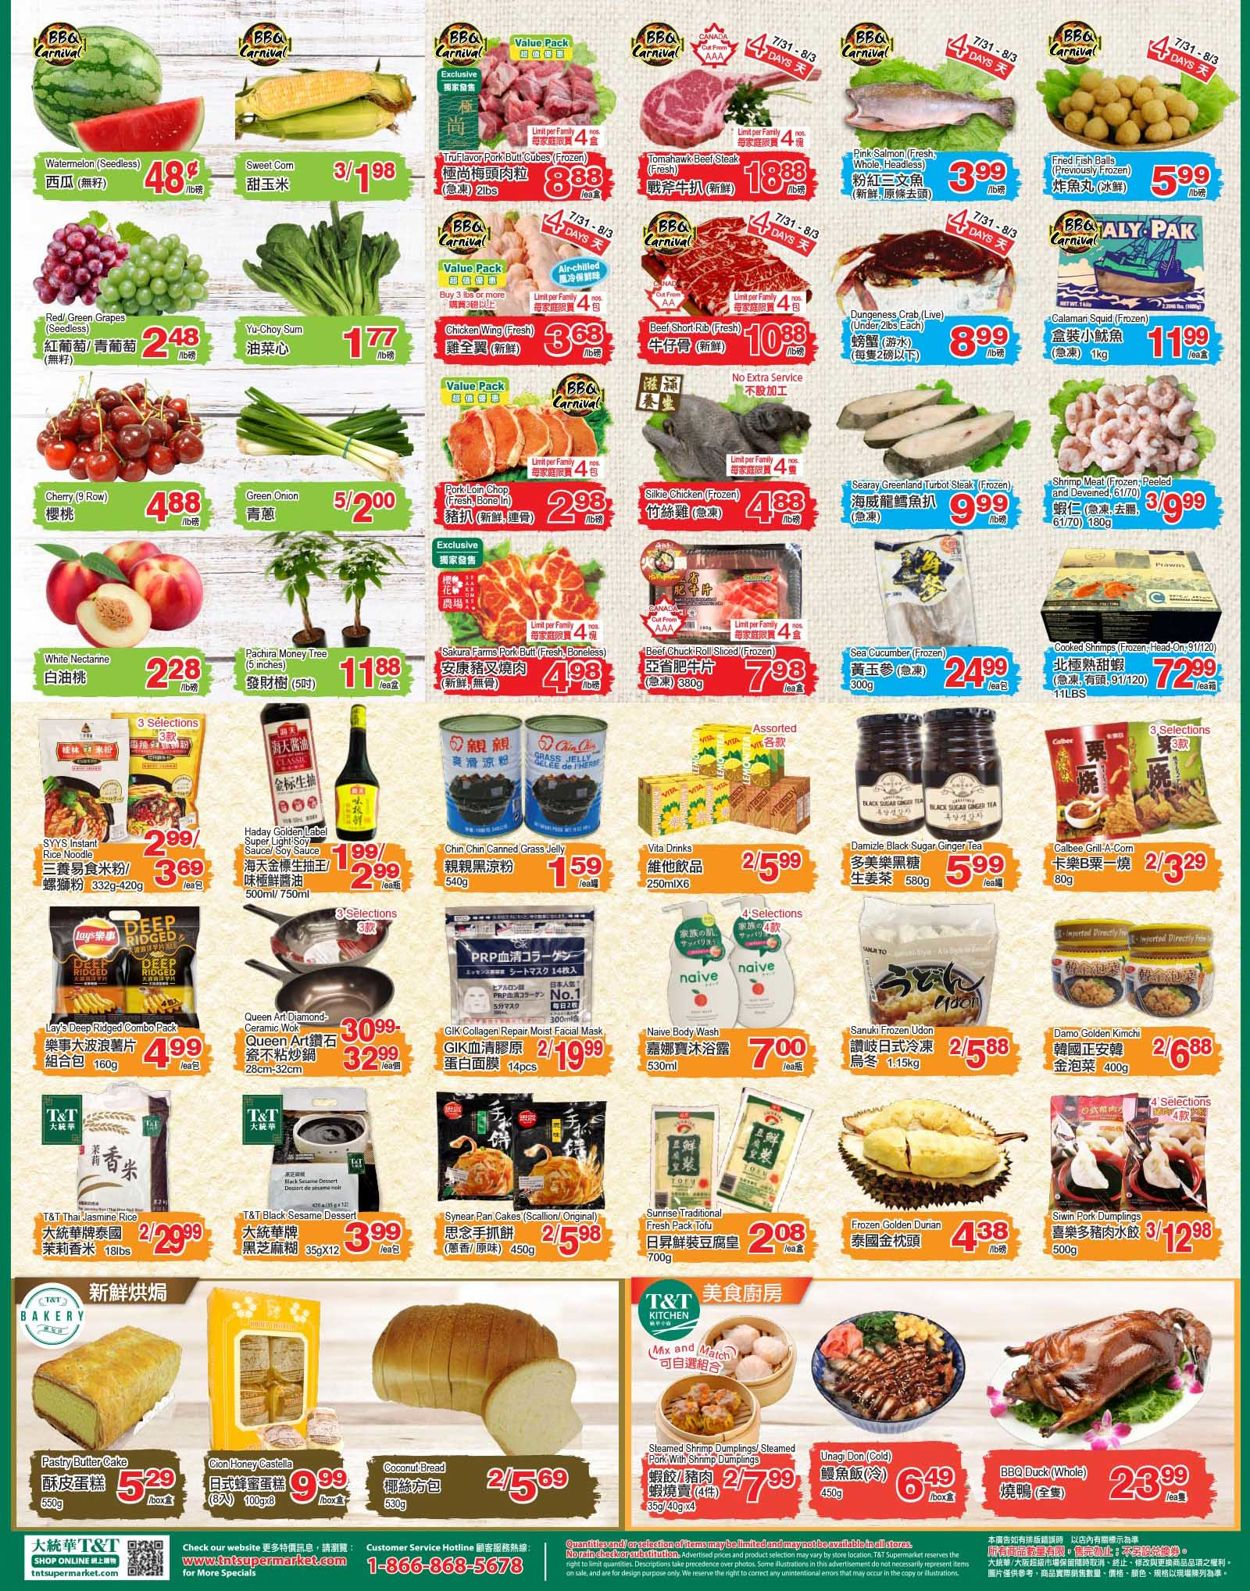 T&T Supermarket Flyer - 07/31-08/06/2020 (Page 2)